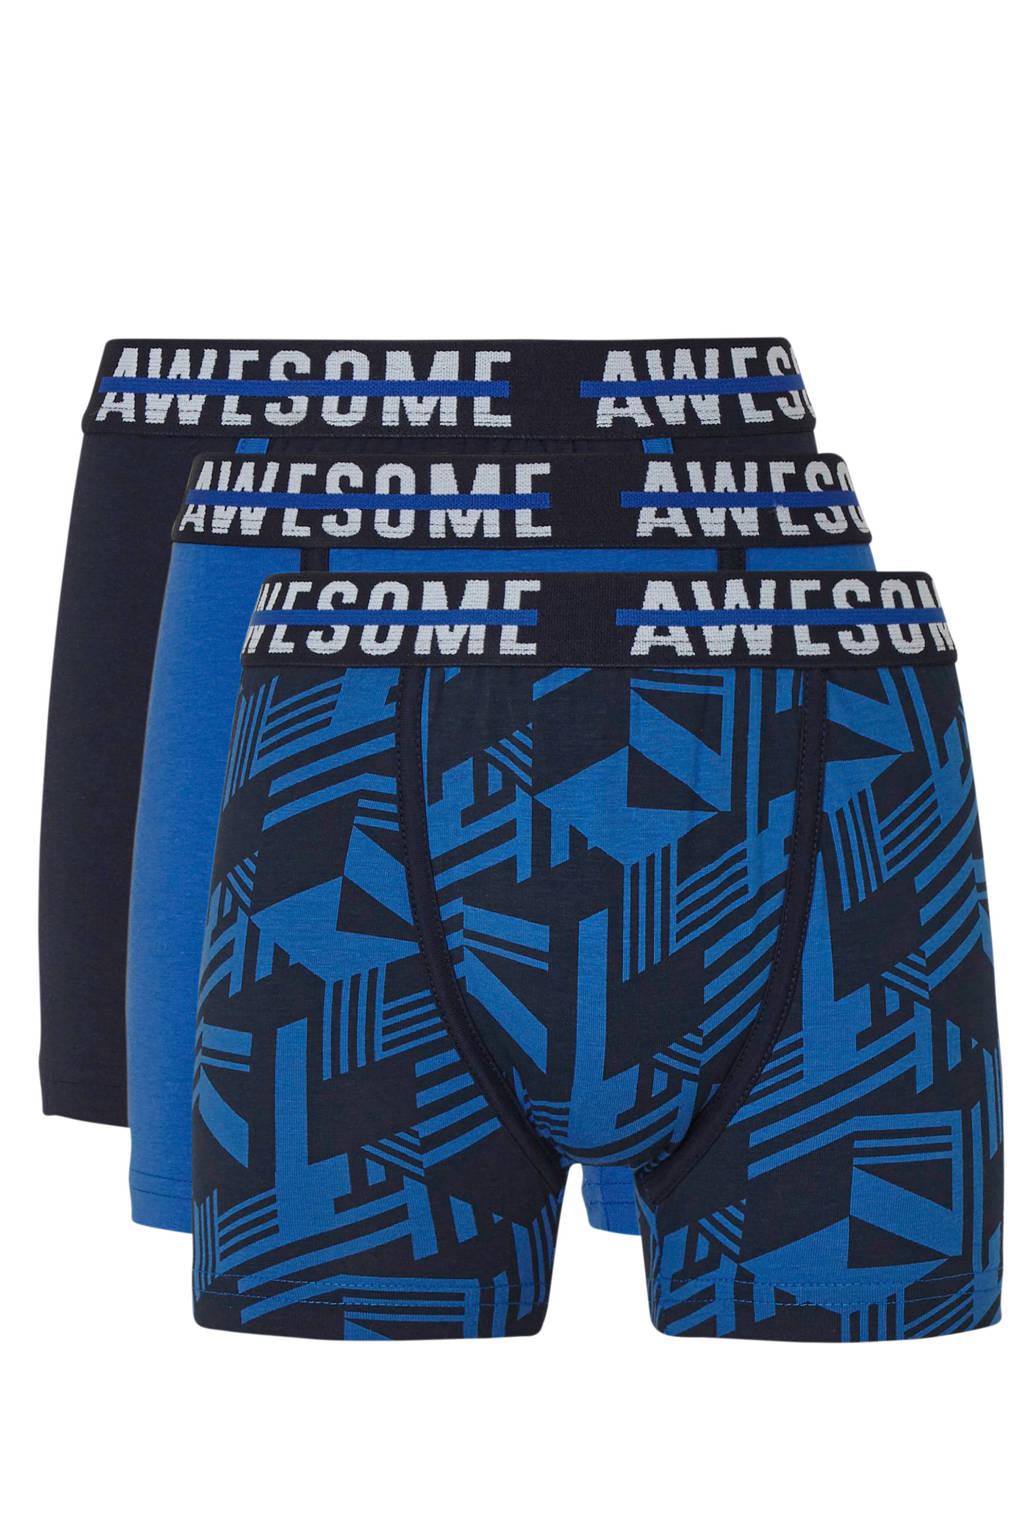 C&A Here & There   boxershorts donkerblauw/zwart - set van 3, Donkerblauw/zwart/wit